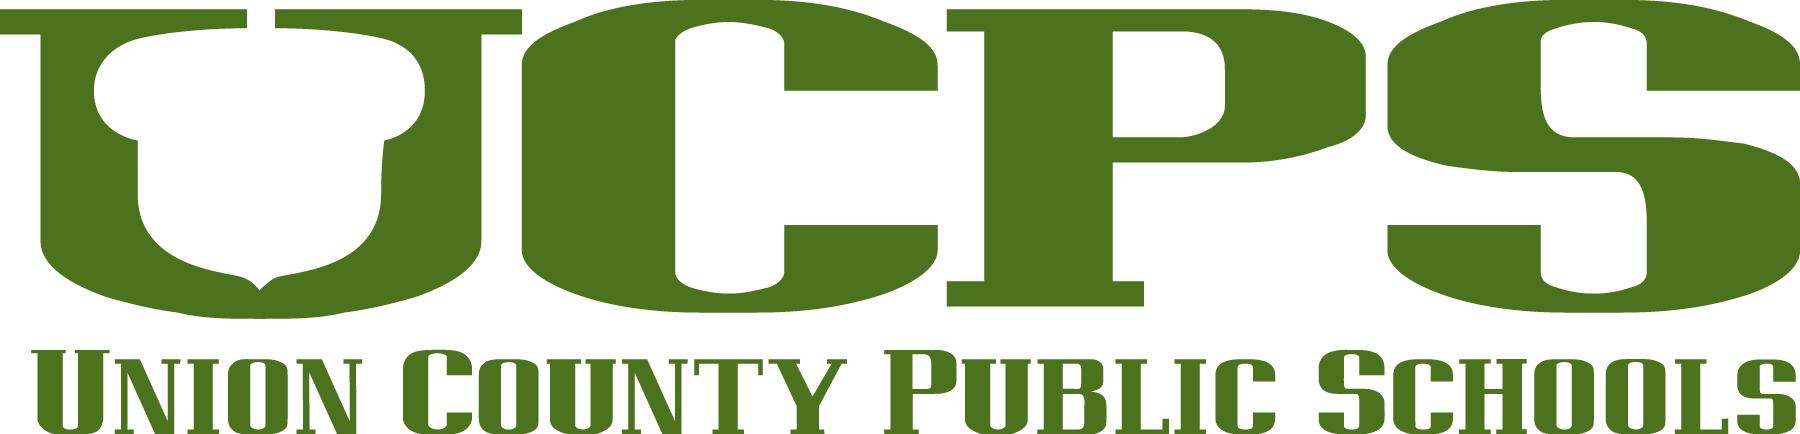 UCPS_Logo_575.jpg